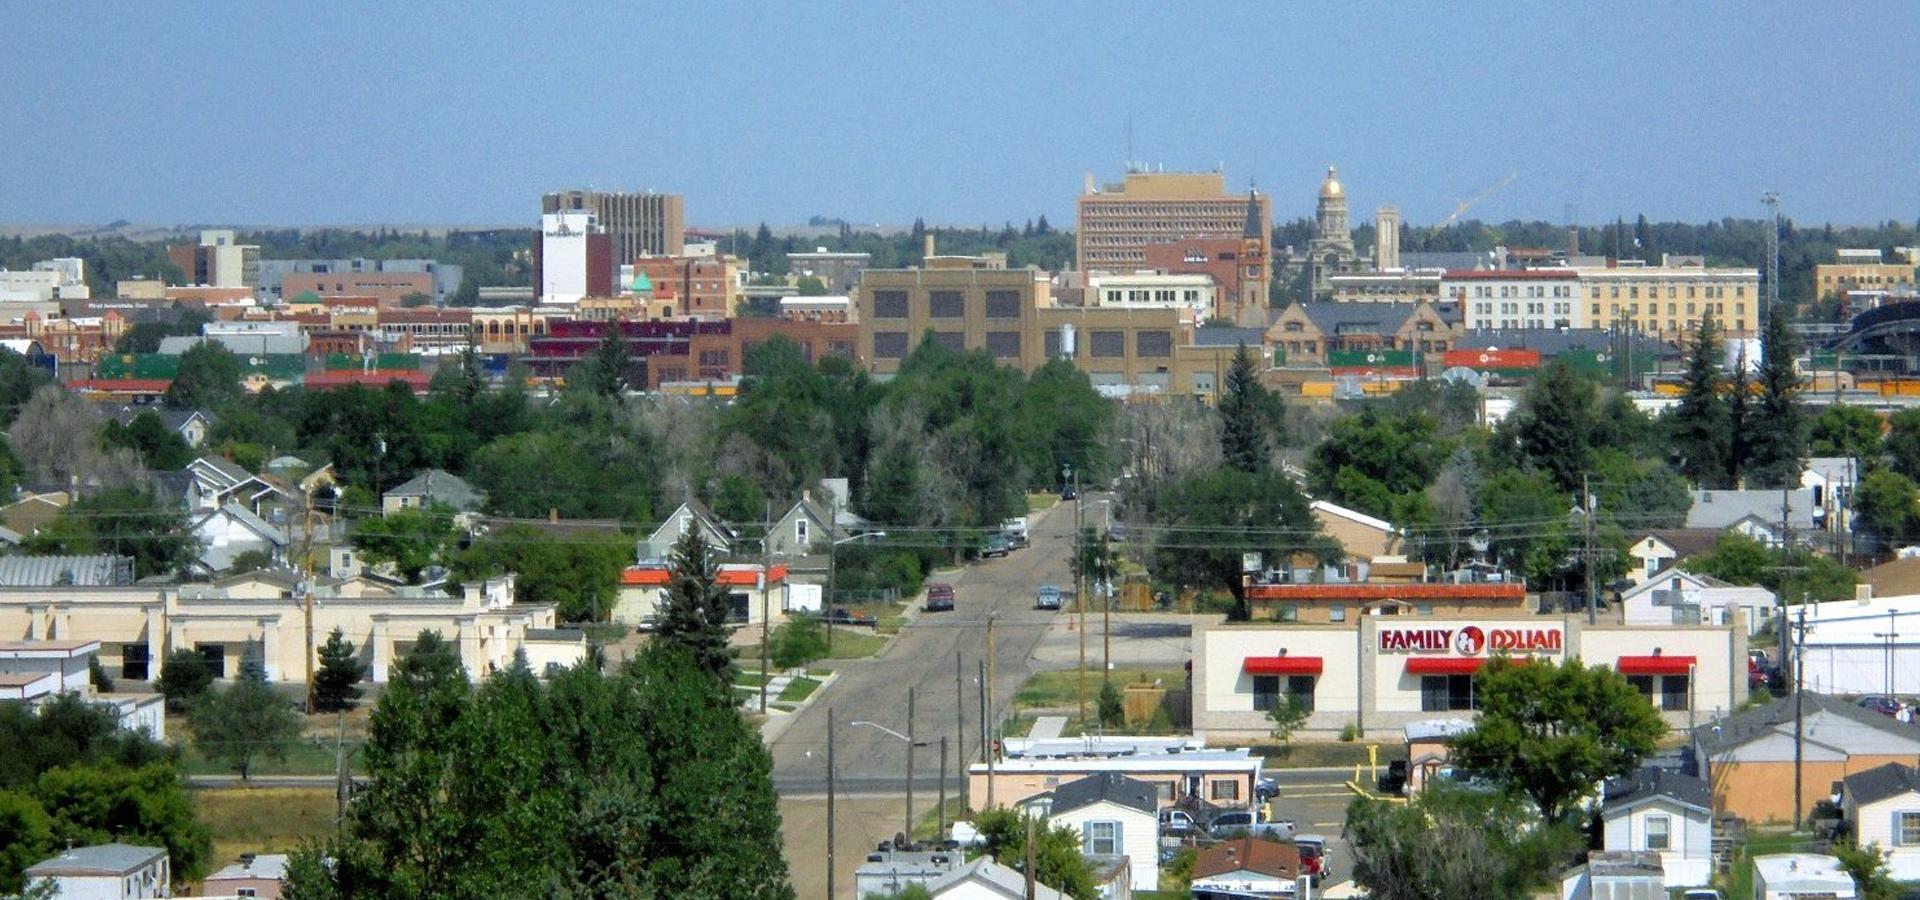 Peer-to-peer advisory in Cheyenne, Wyoming, USA